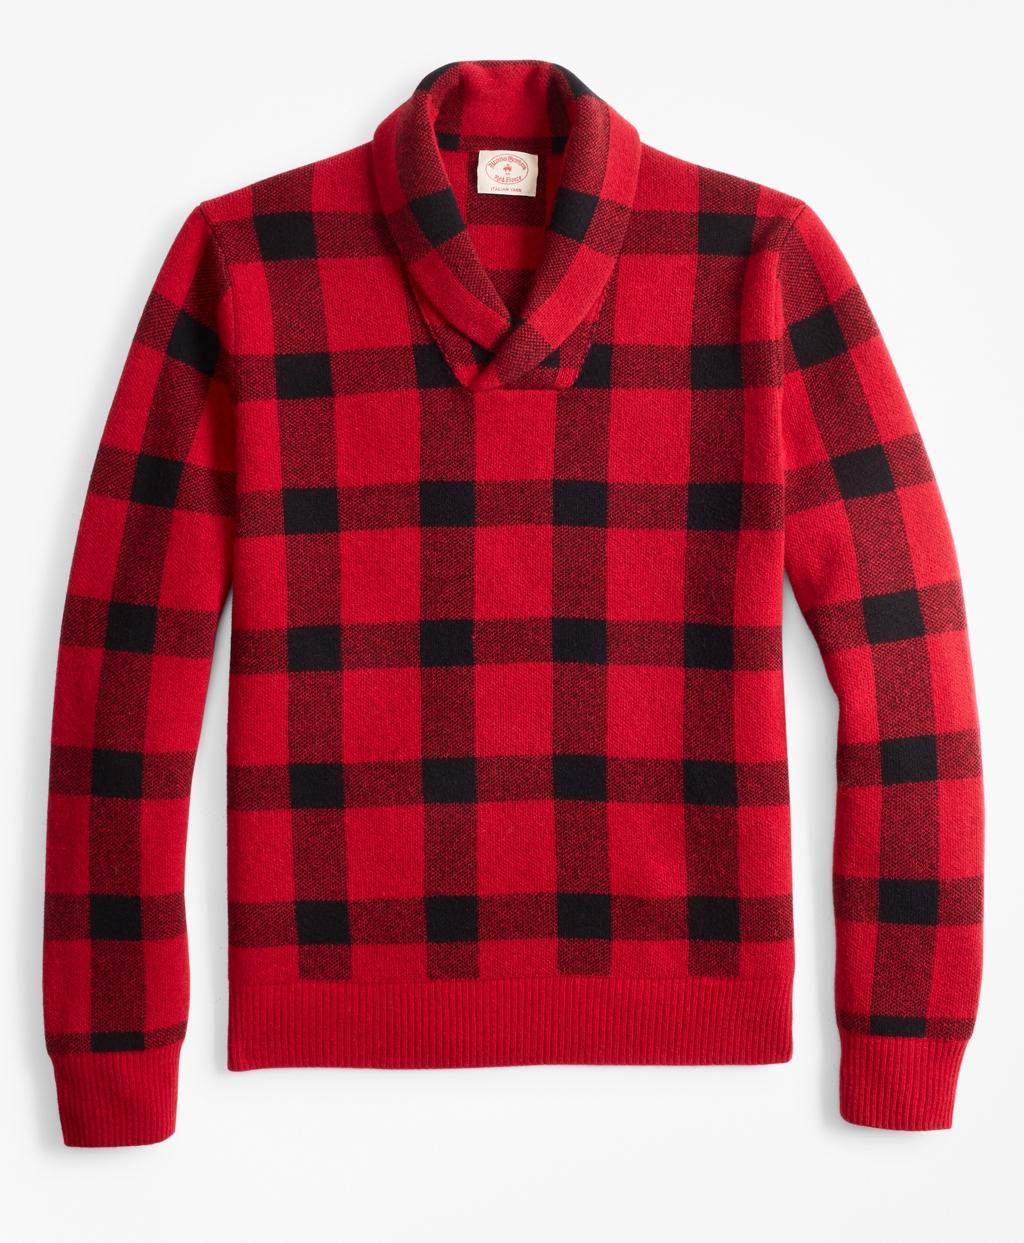 1960s Men's Clothing, 70s Men's Fashion Brooks Brothers Mens Merino Wool-Blend Buffalo Plaid Shawl-Collar Sweater $108.00 AT vintagedancer.com